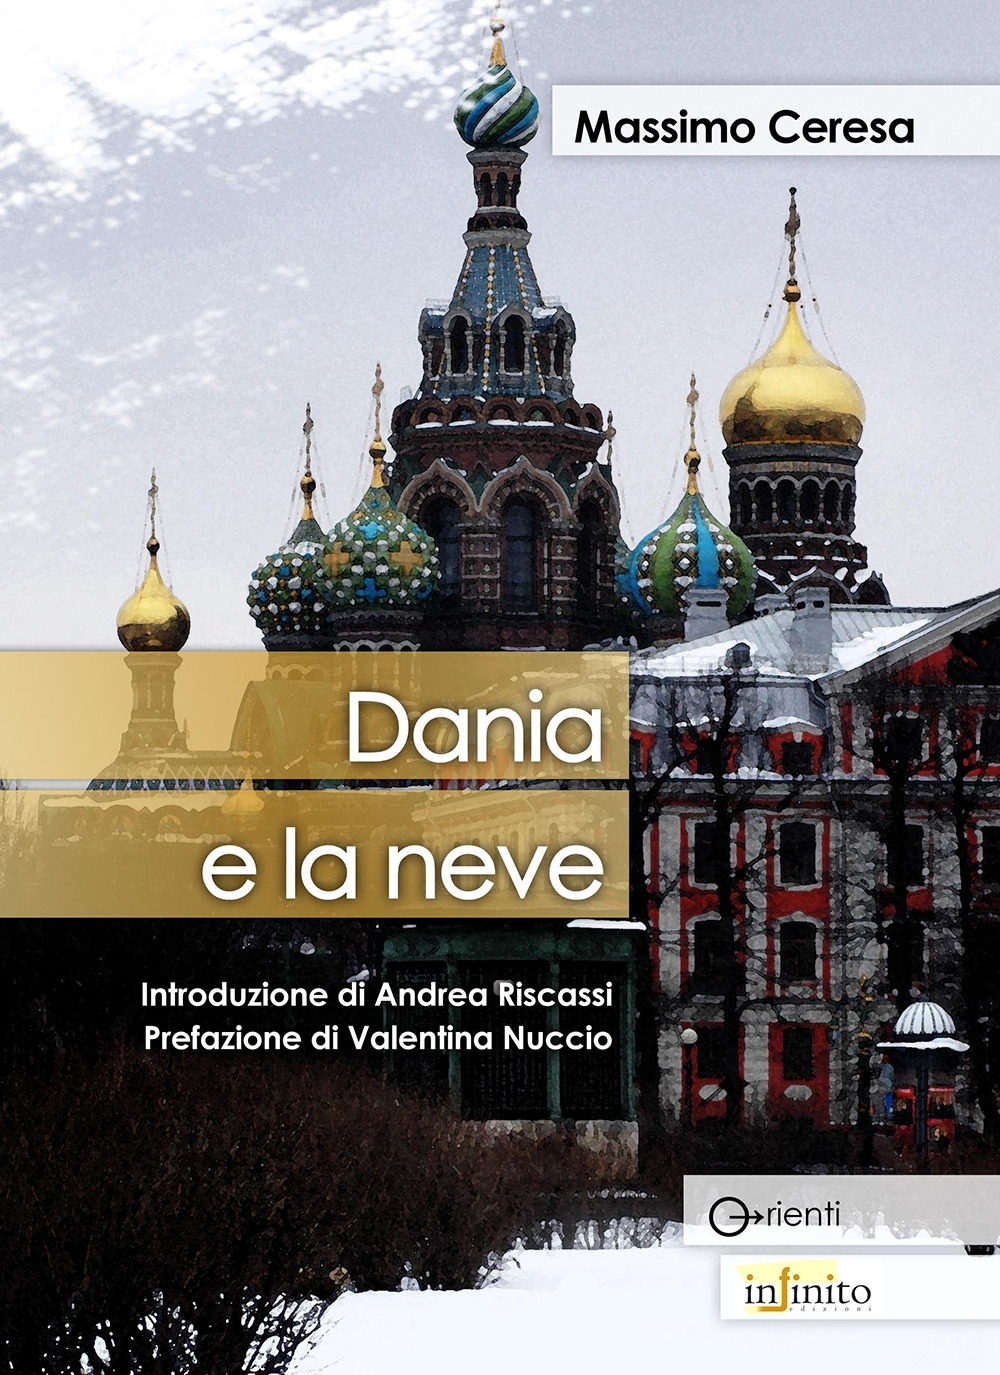 Dania e la neve - Ceresa, Massimo